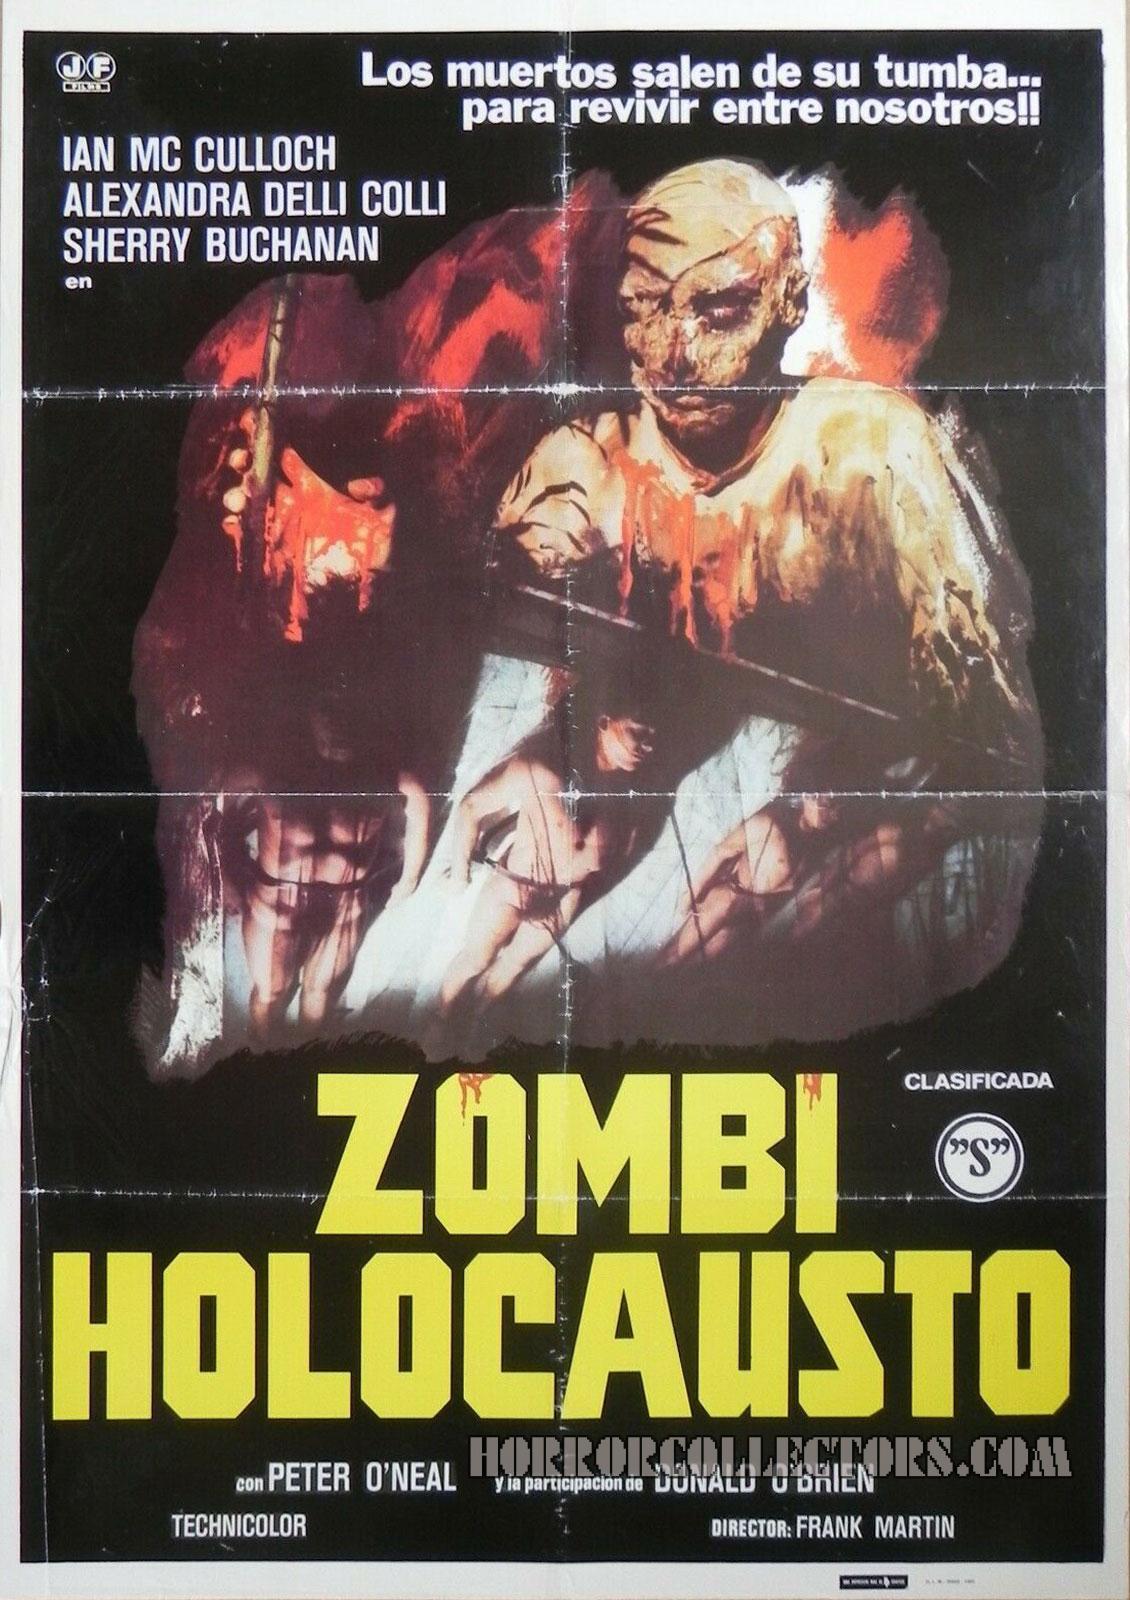 Zombi Holocausto Spanish Poster